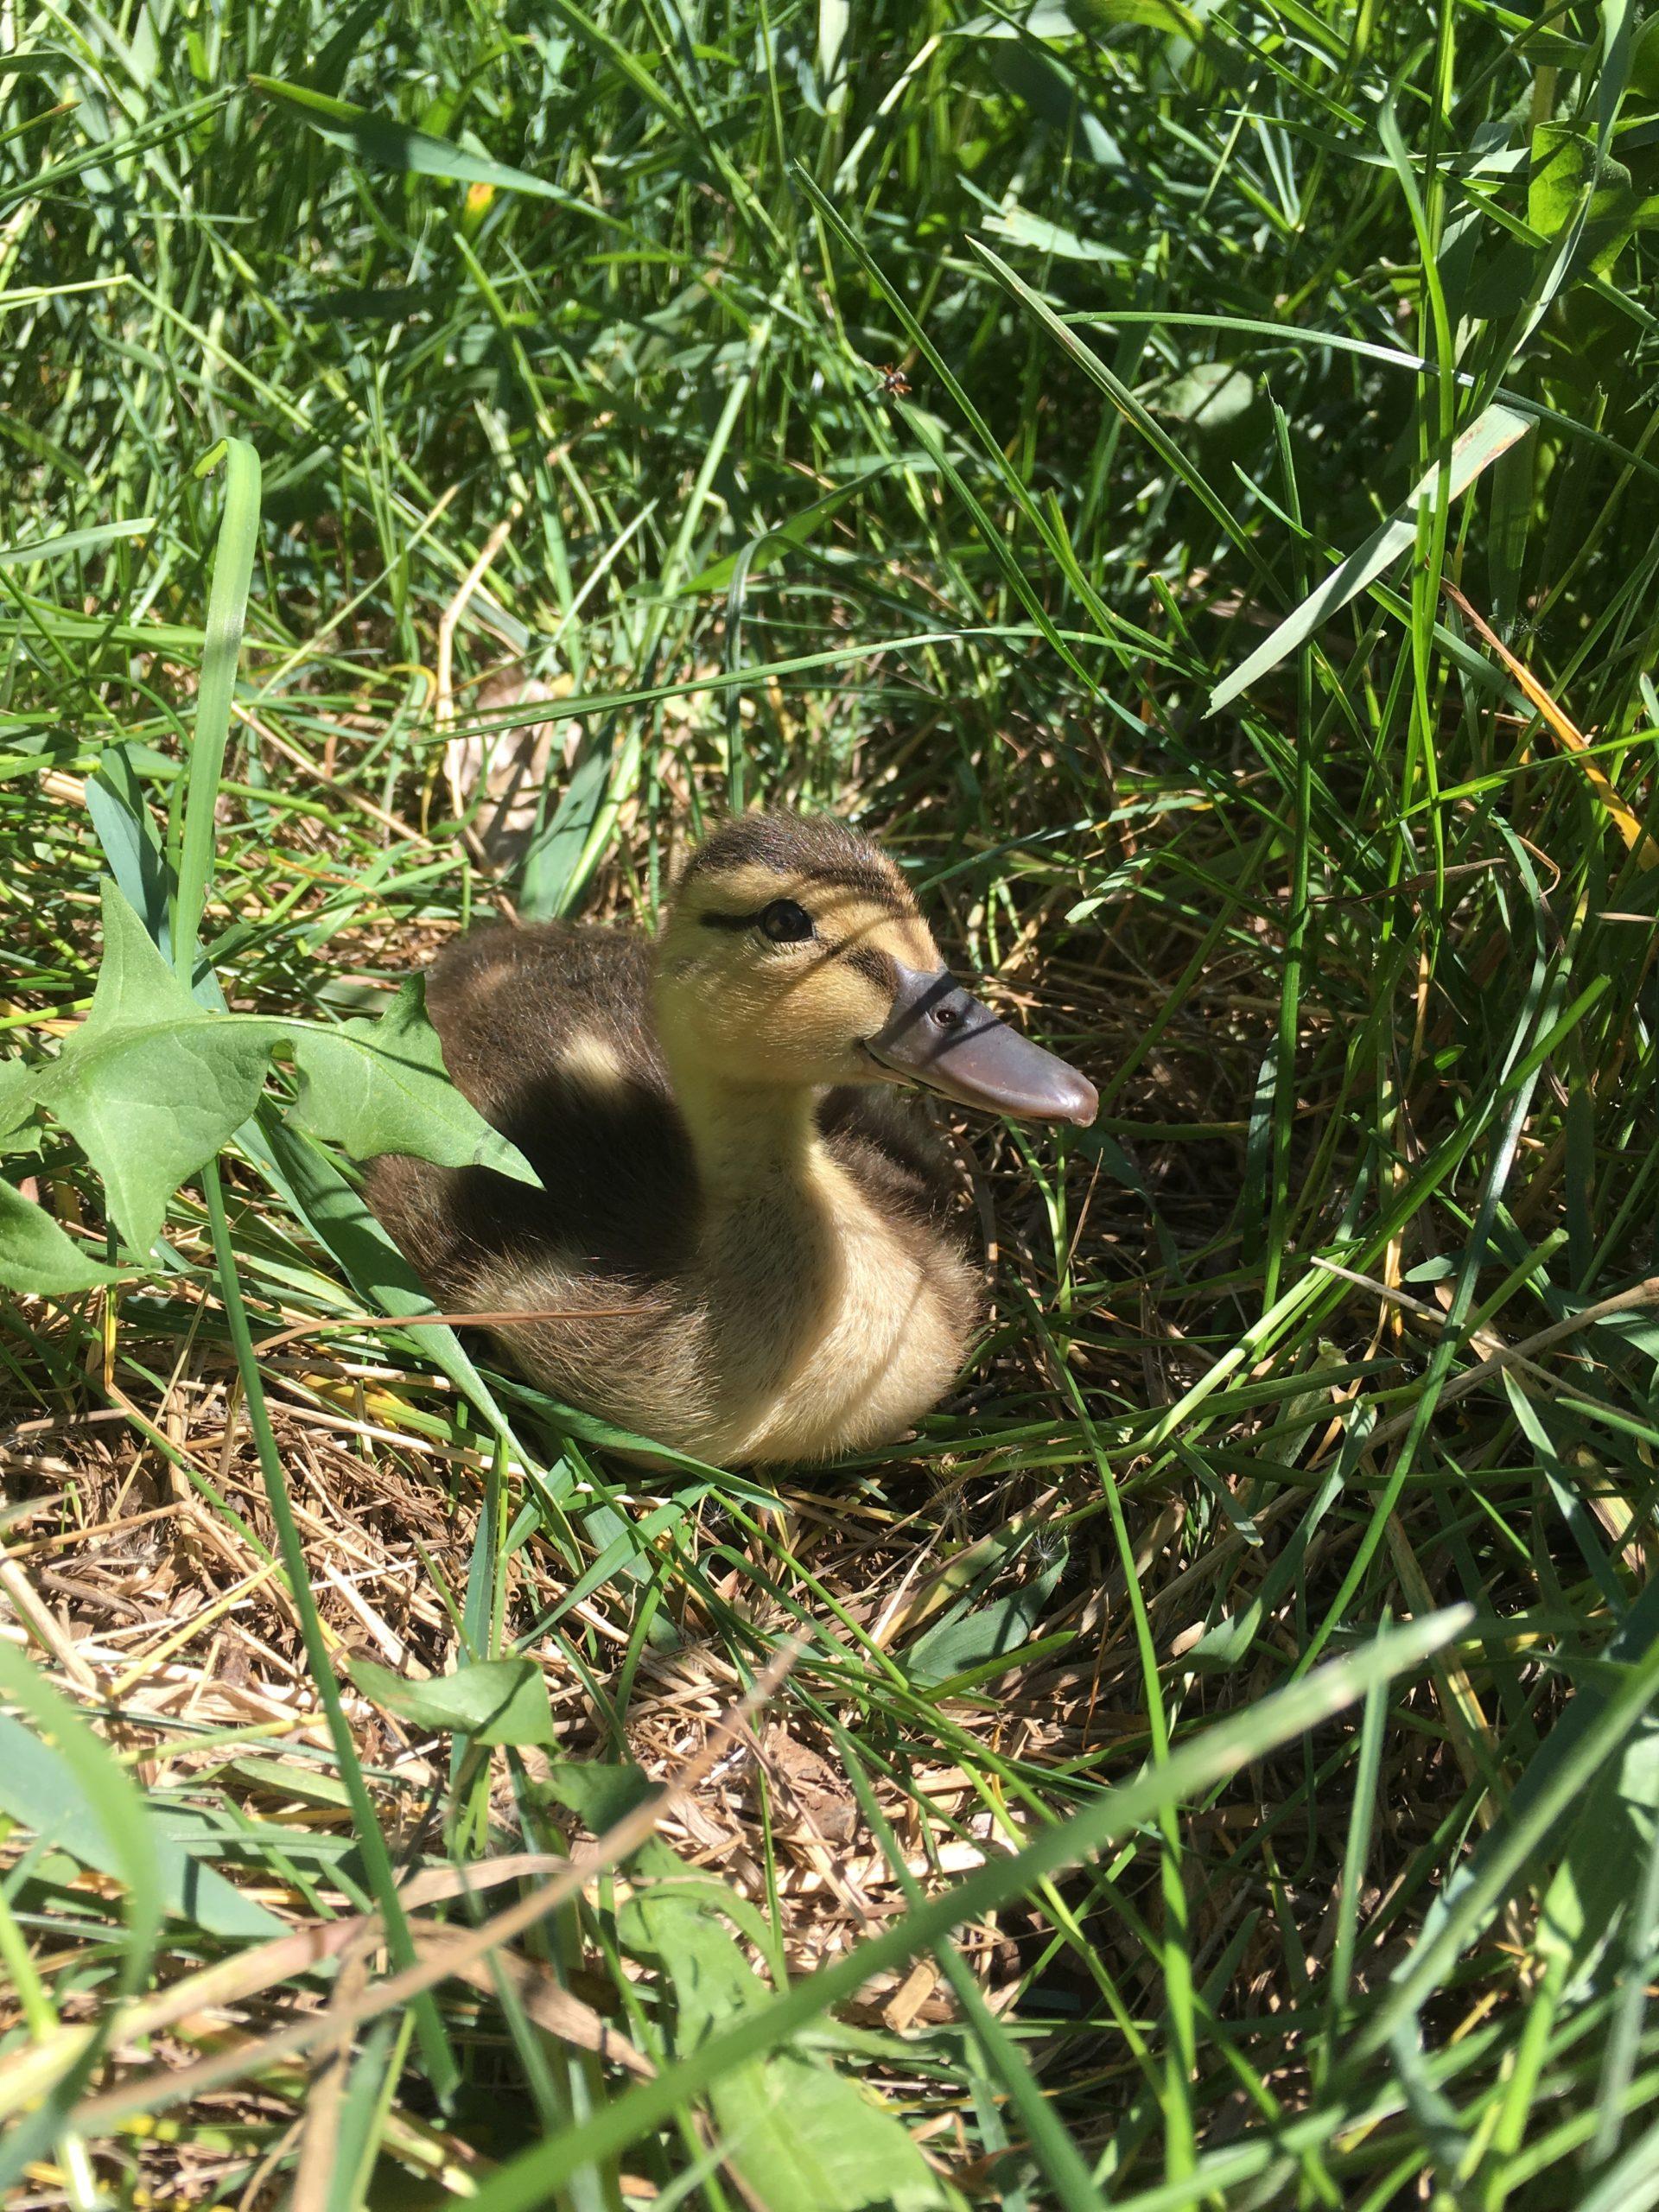 Ducklings_June 2019_Vicki H (9)